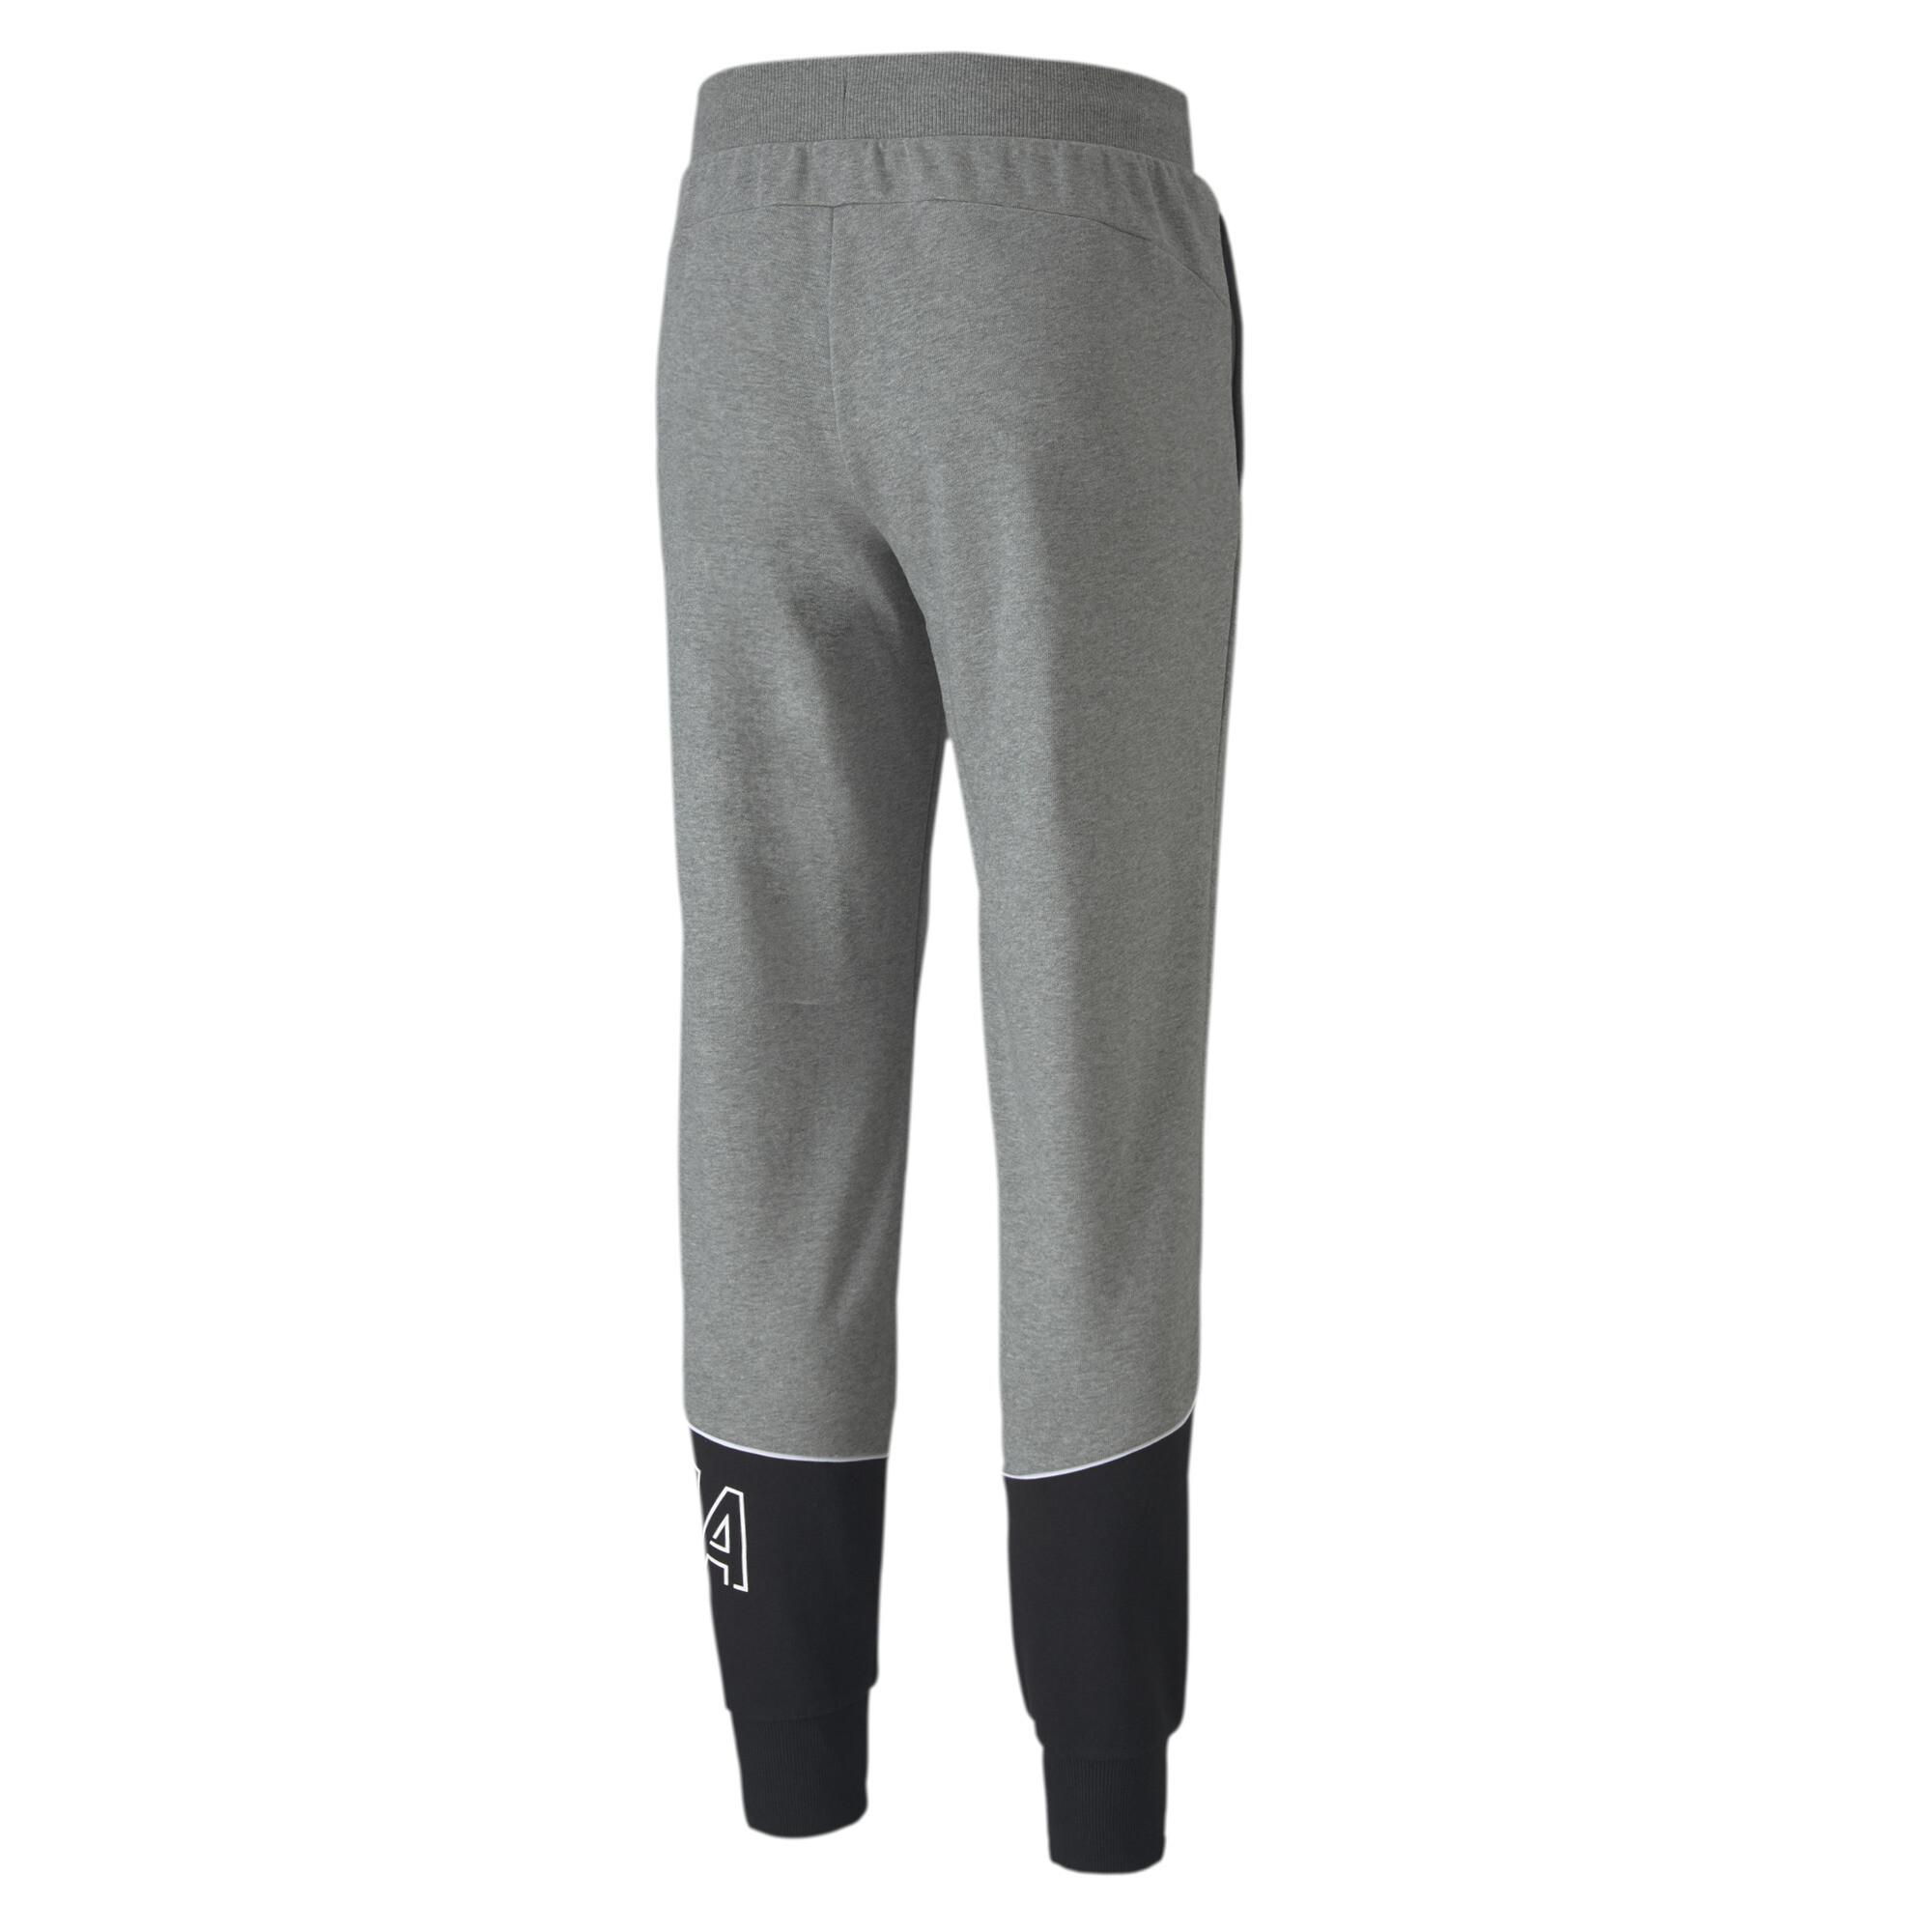 PUMA-Men-039-s-Modern-Sports-Sweatpants thumbnail 3